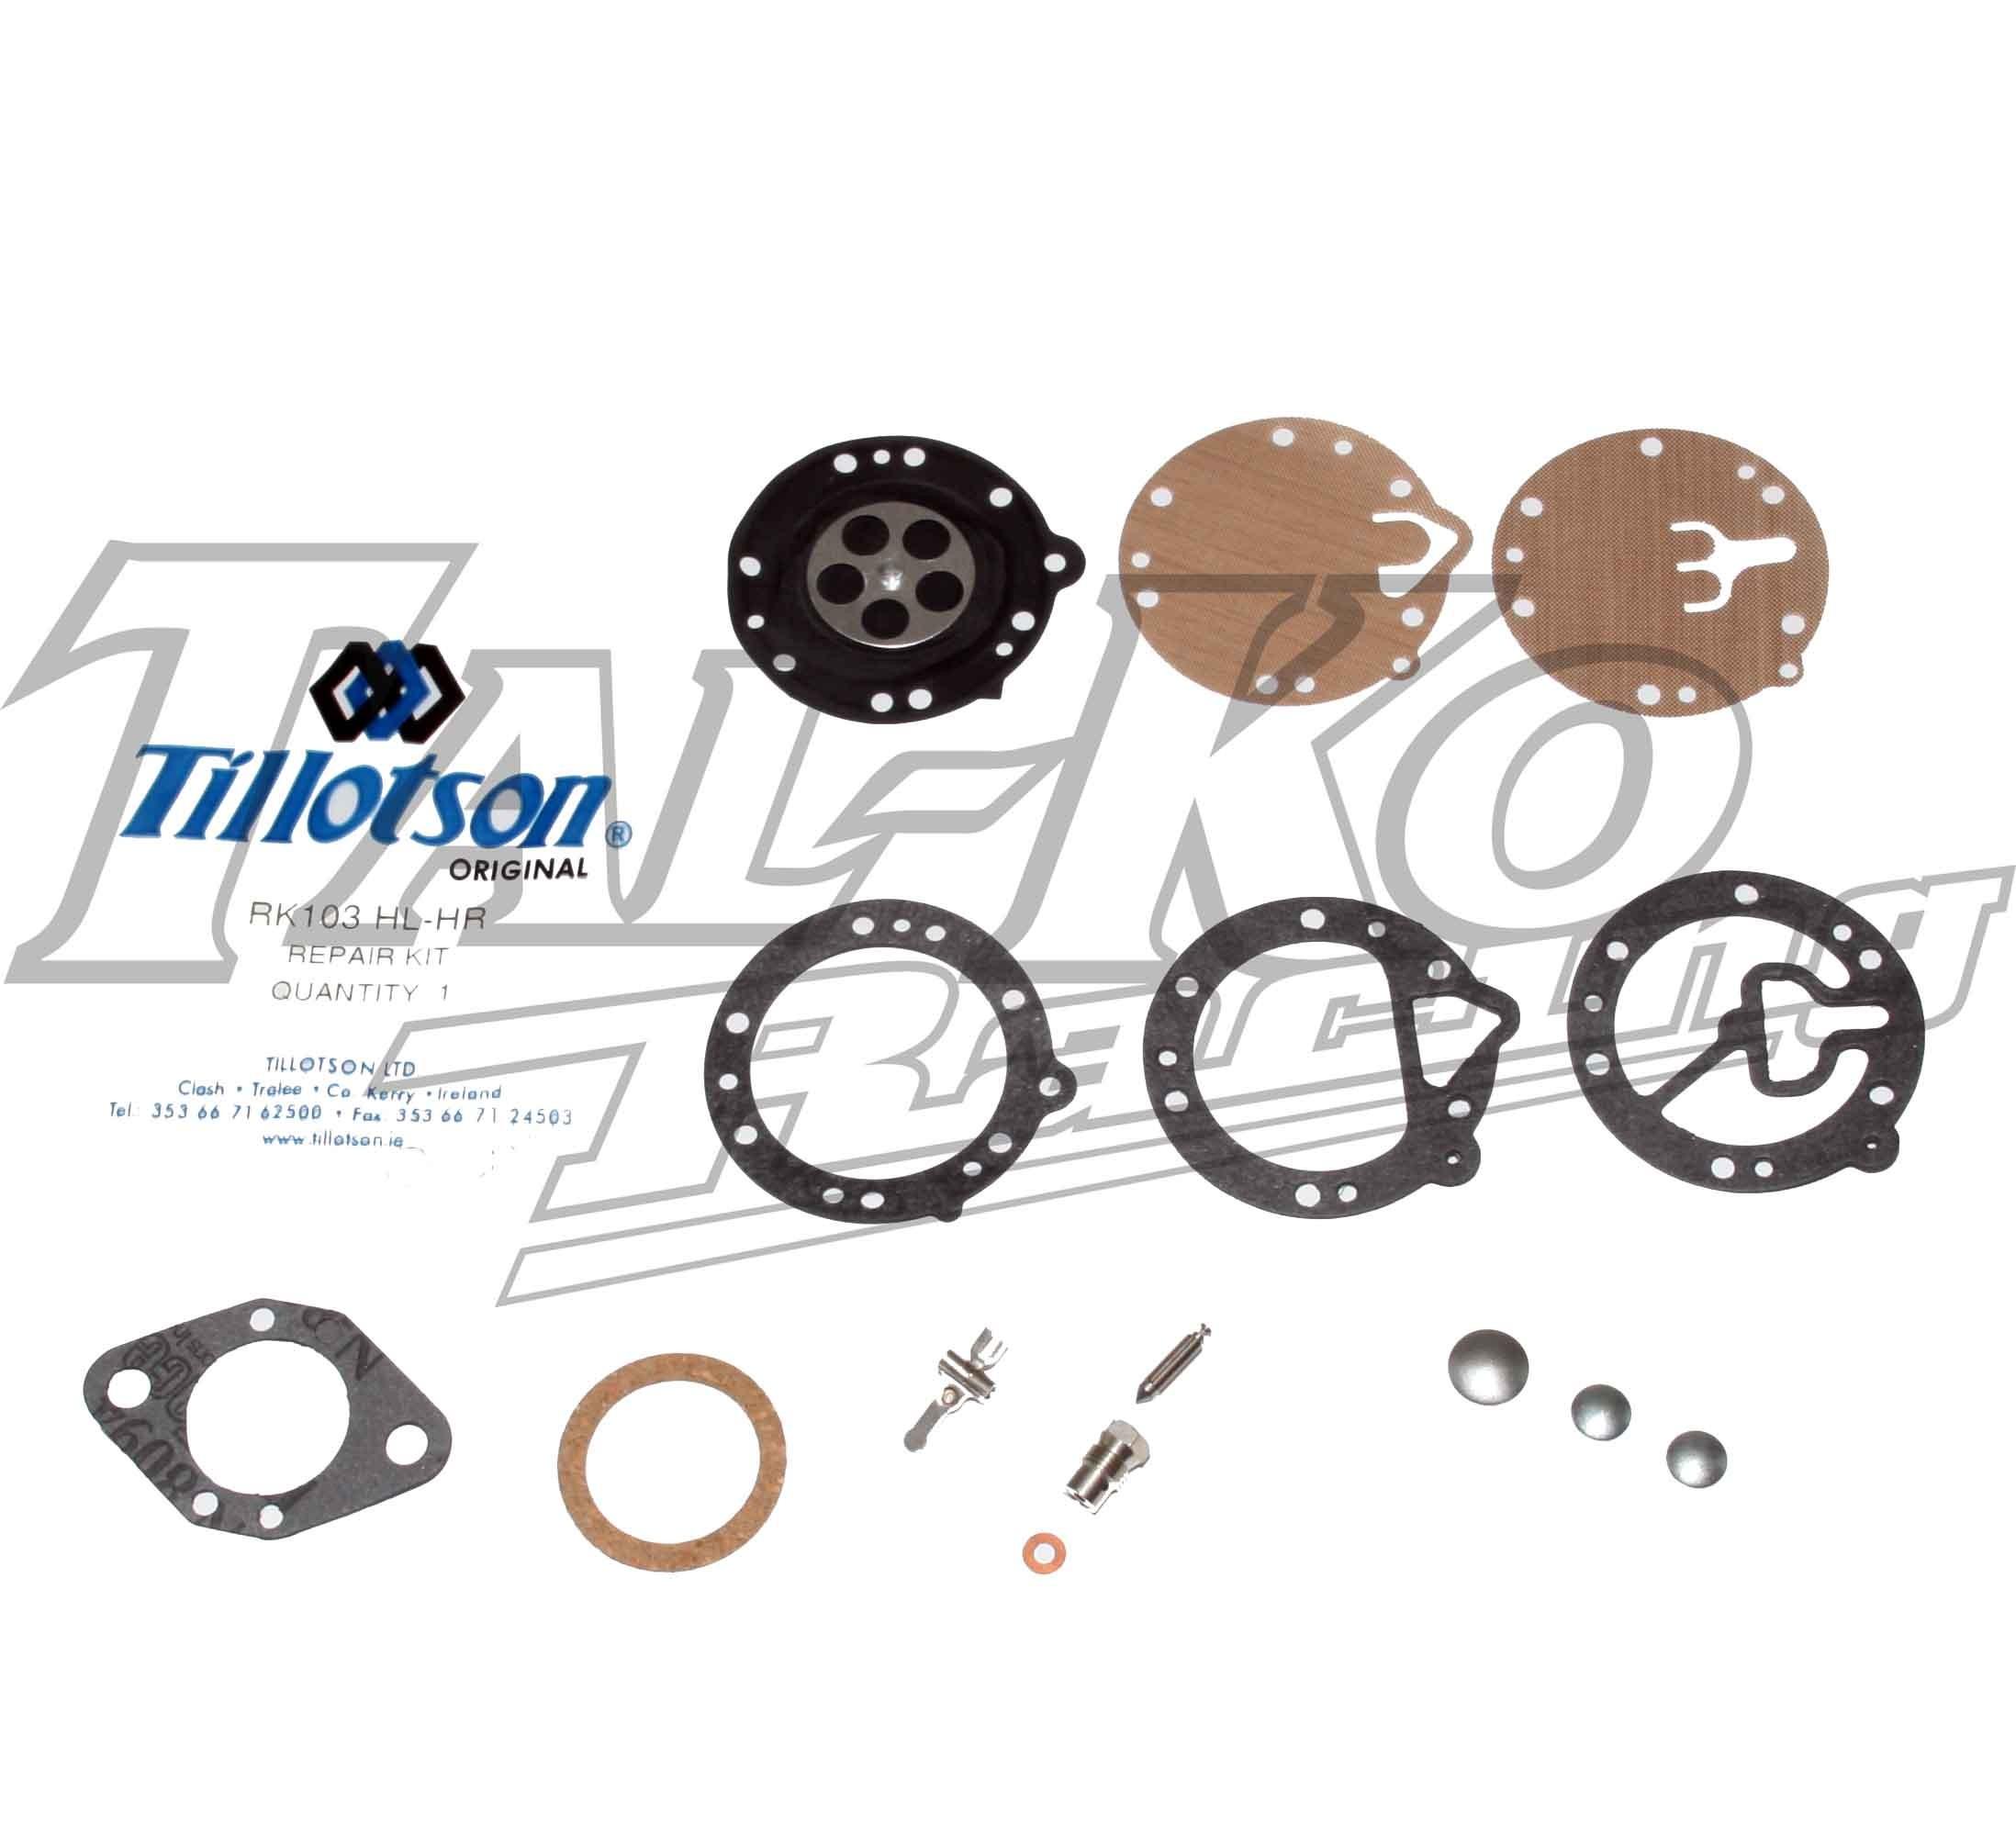 TILLOTSON HL-HR CARB REPAIR KIT RK103 HL-HR  FULL